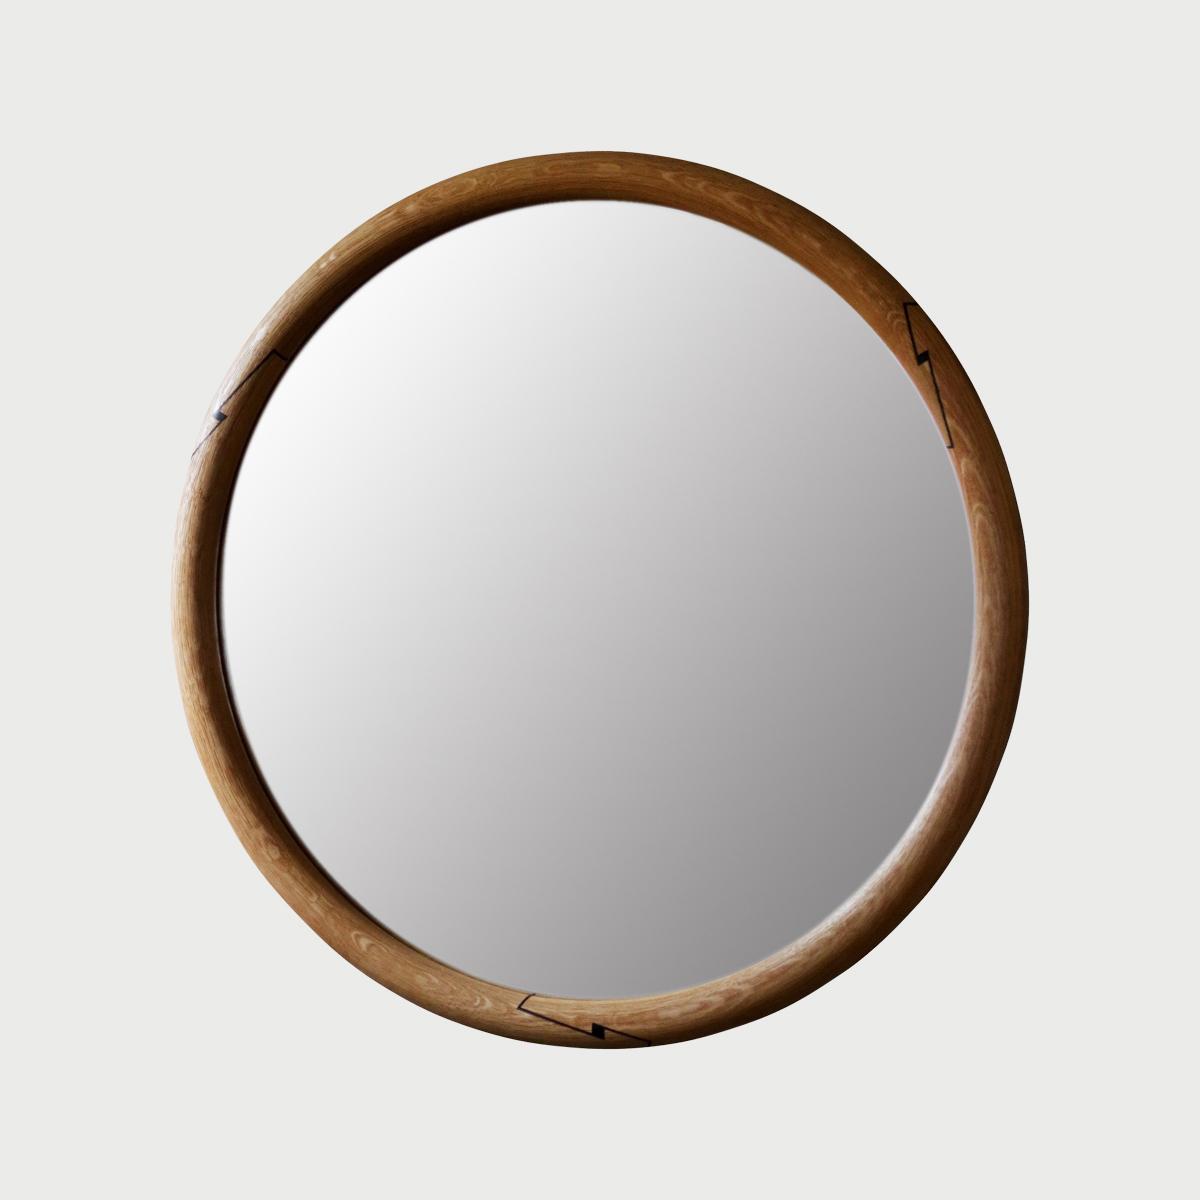 Workof mirror 01